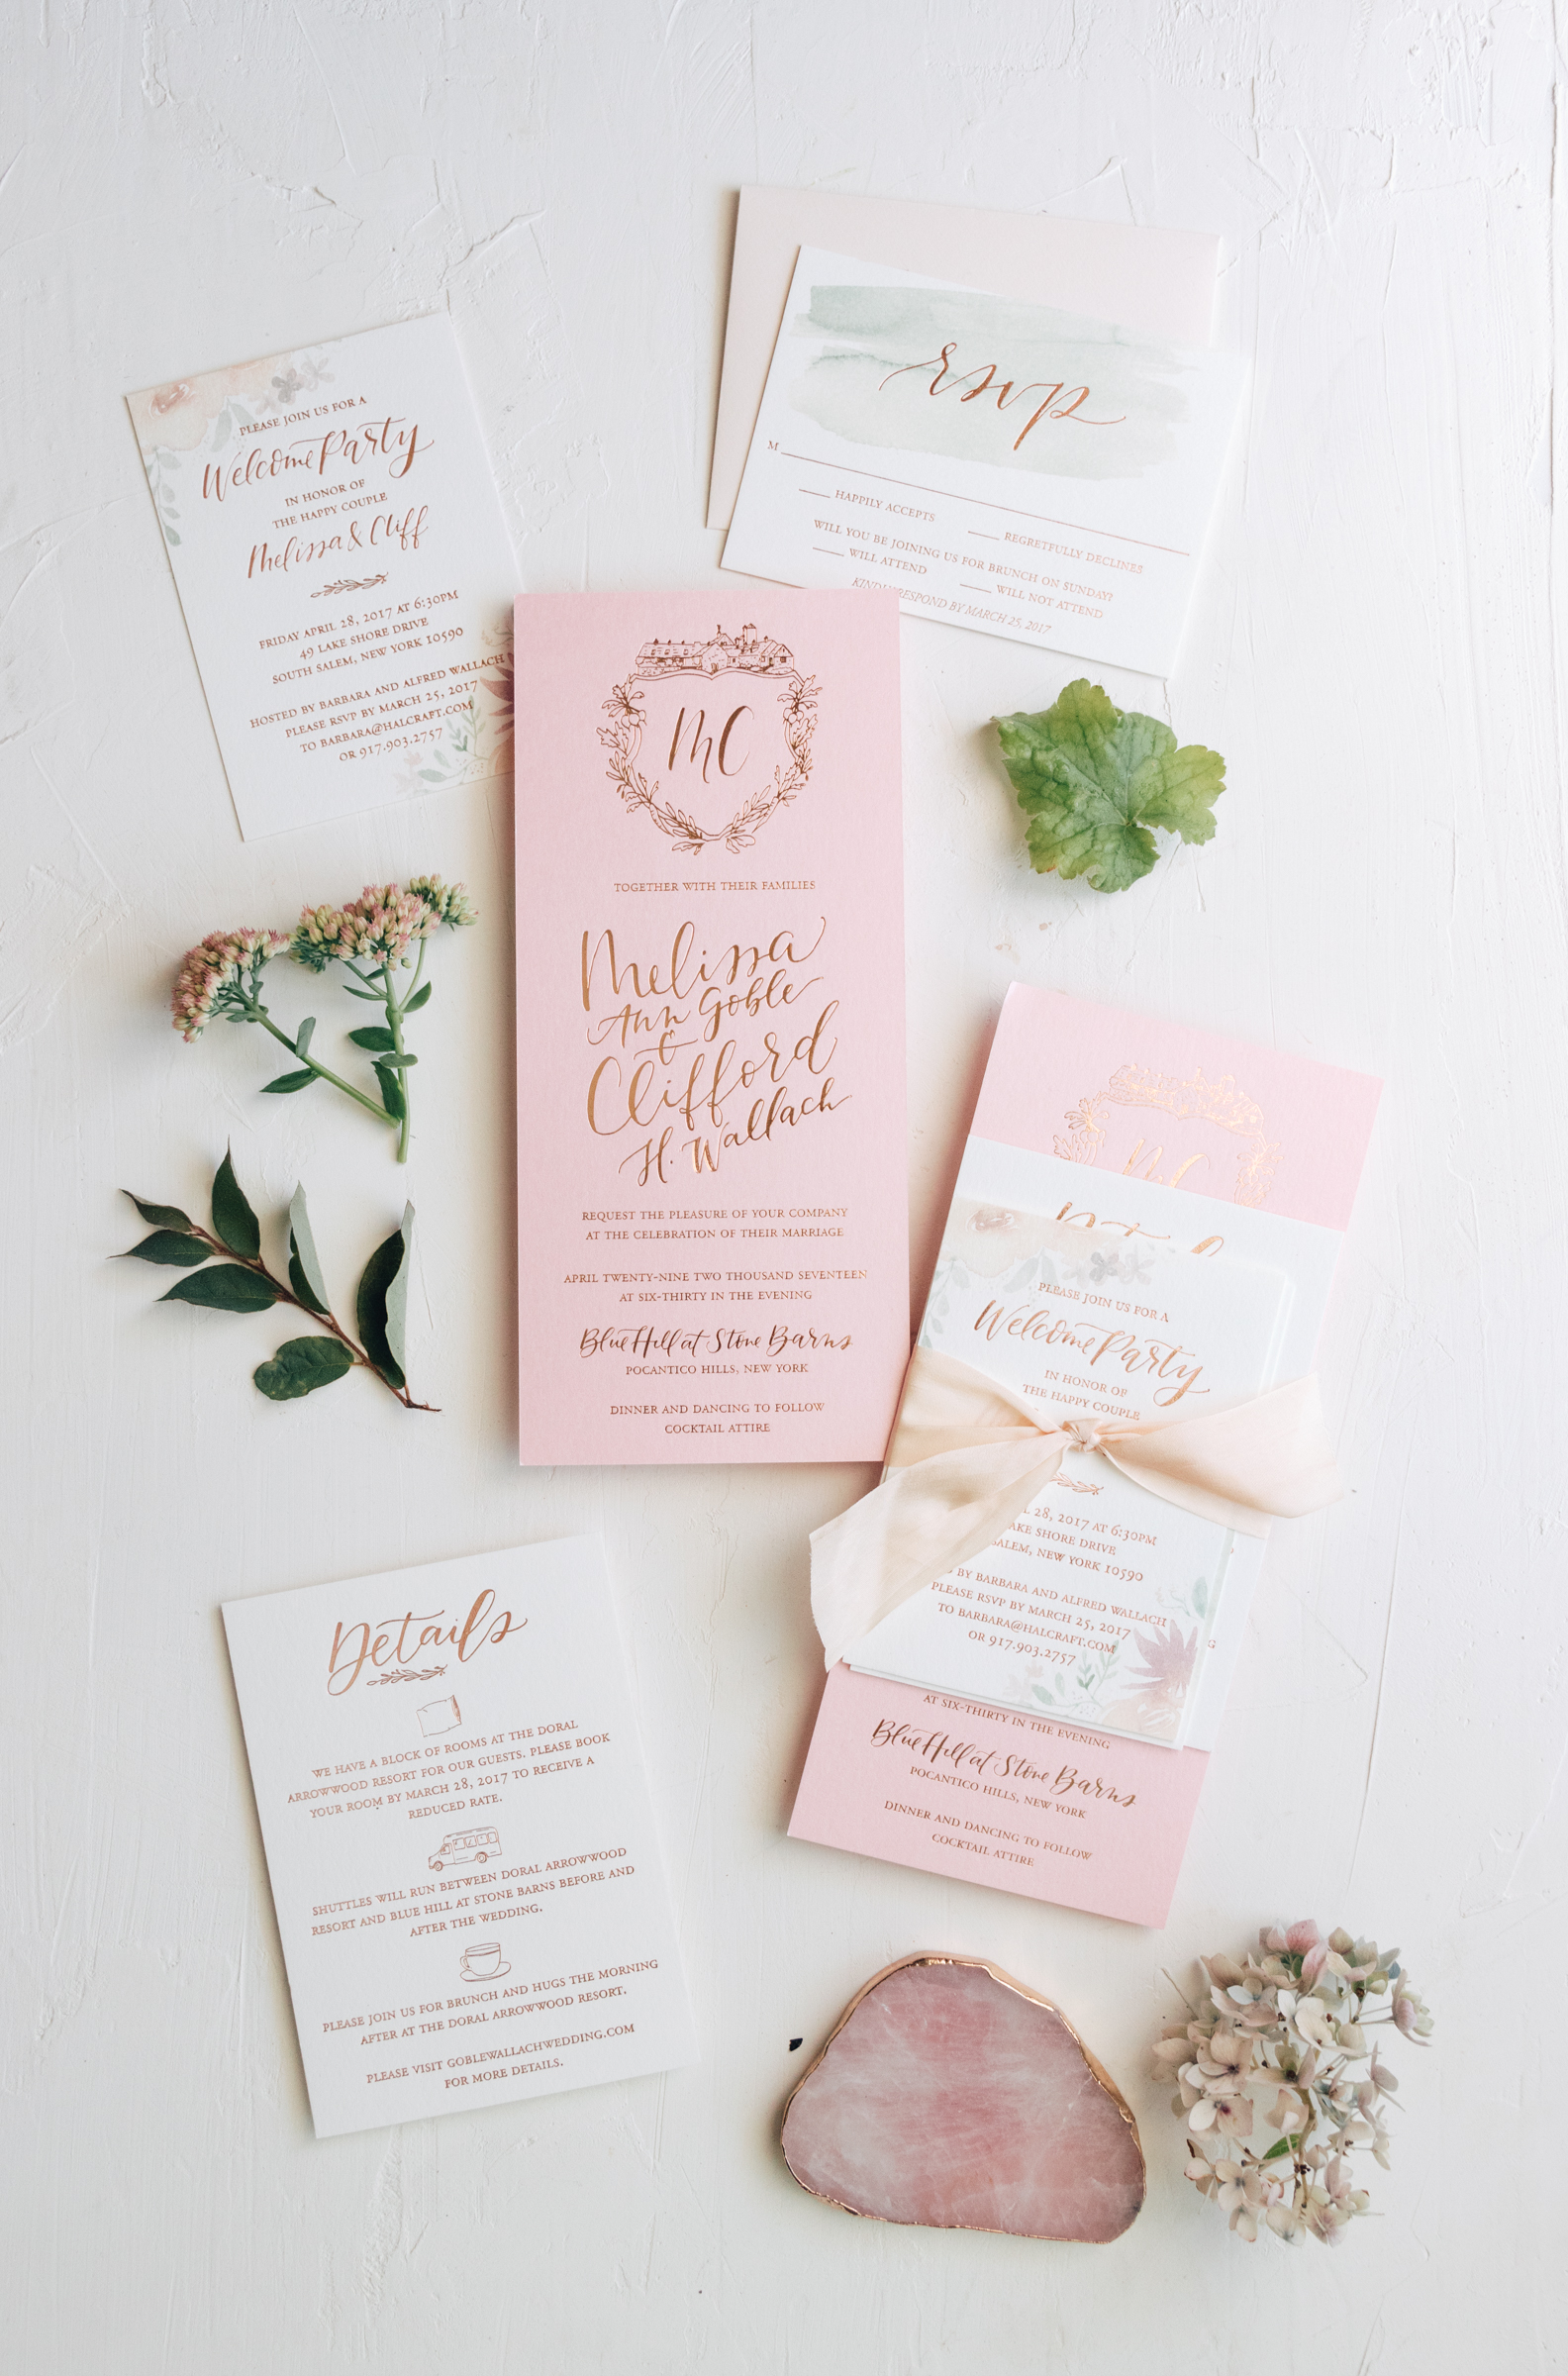 Romantic Wedding Invitation Suite with Copper Foil Crest